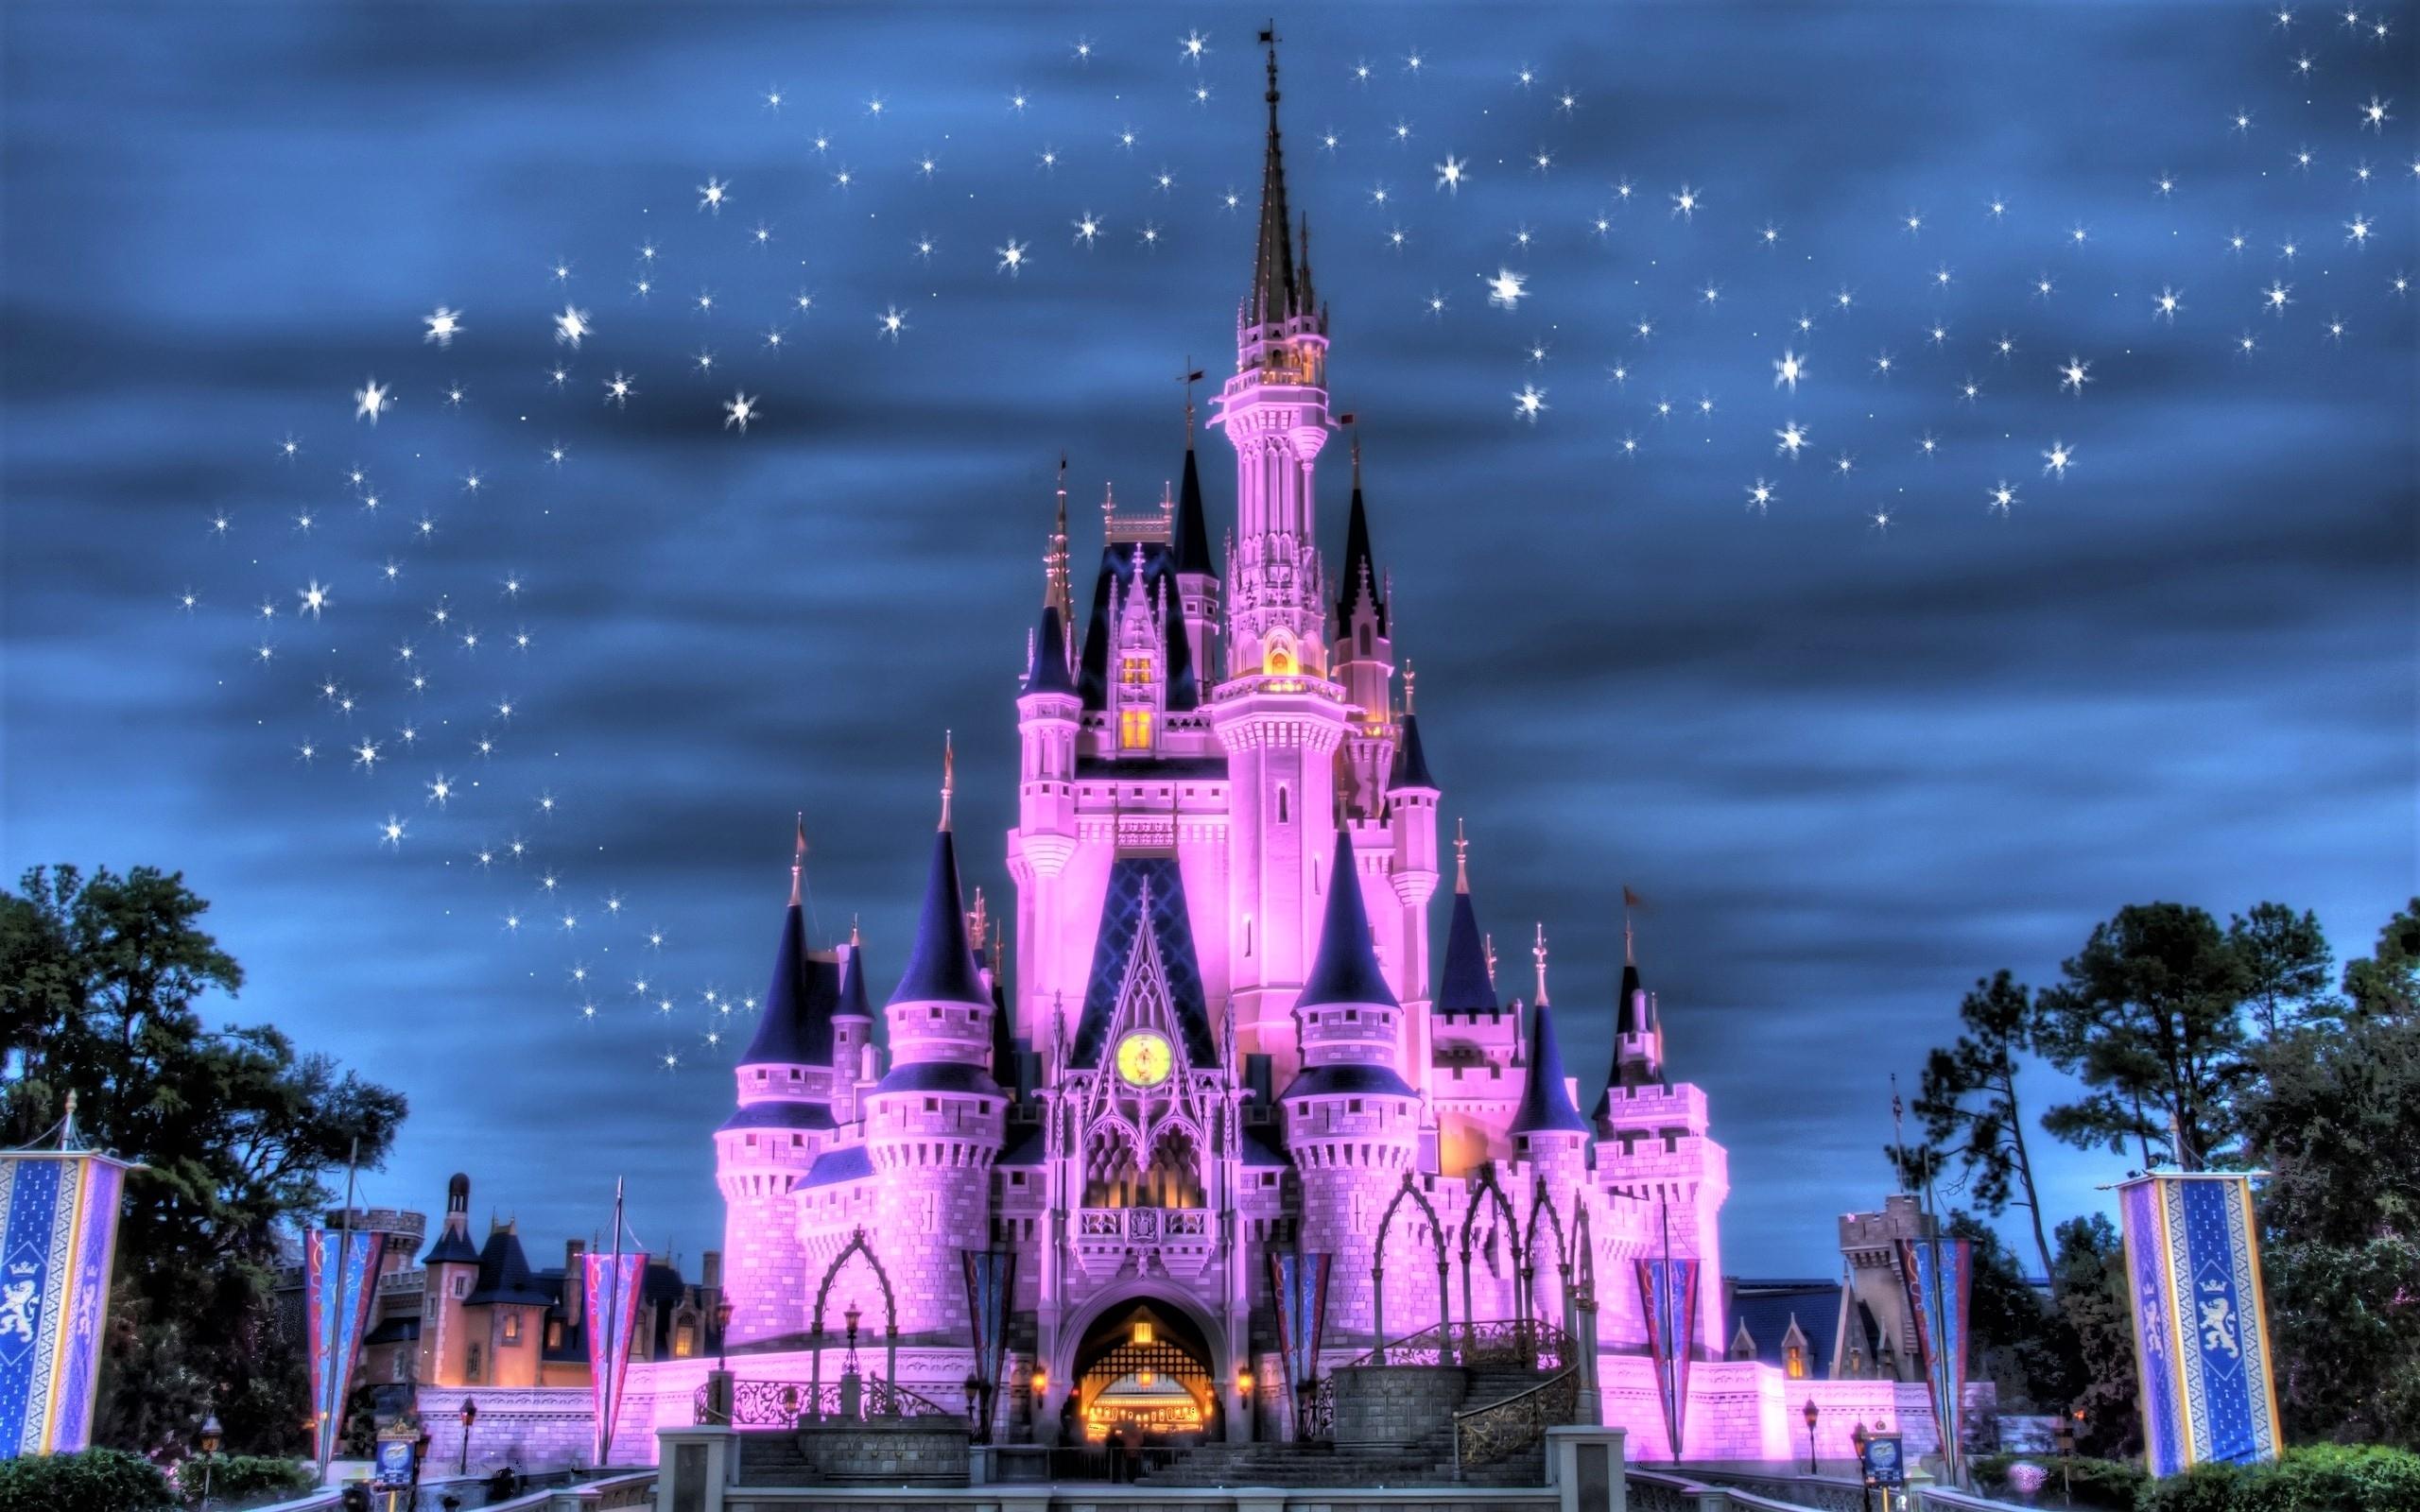 disneyland castle full hd fond d'écran and arrière-plan | 2560x1600